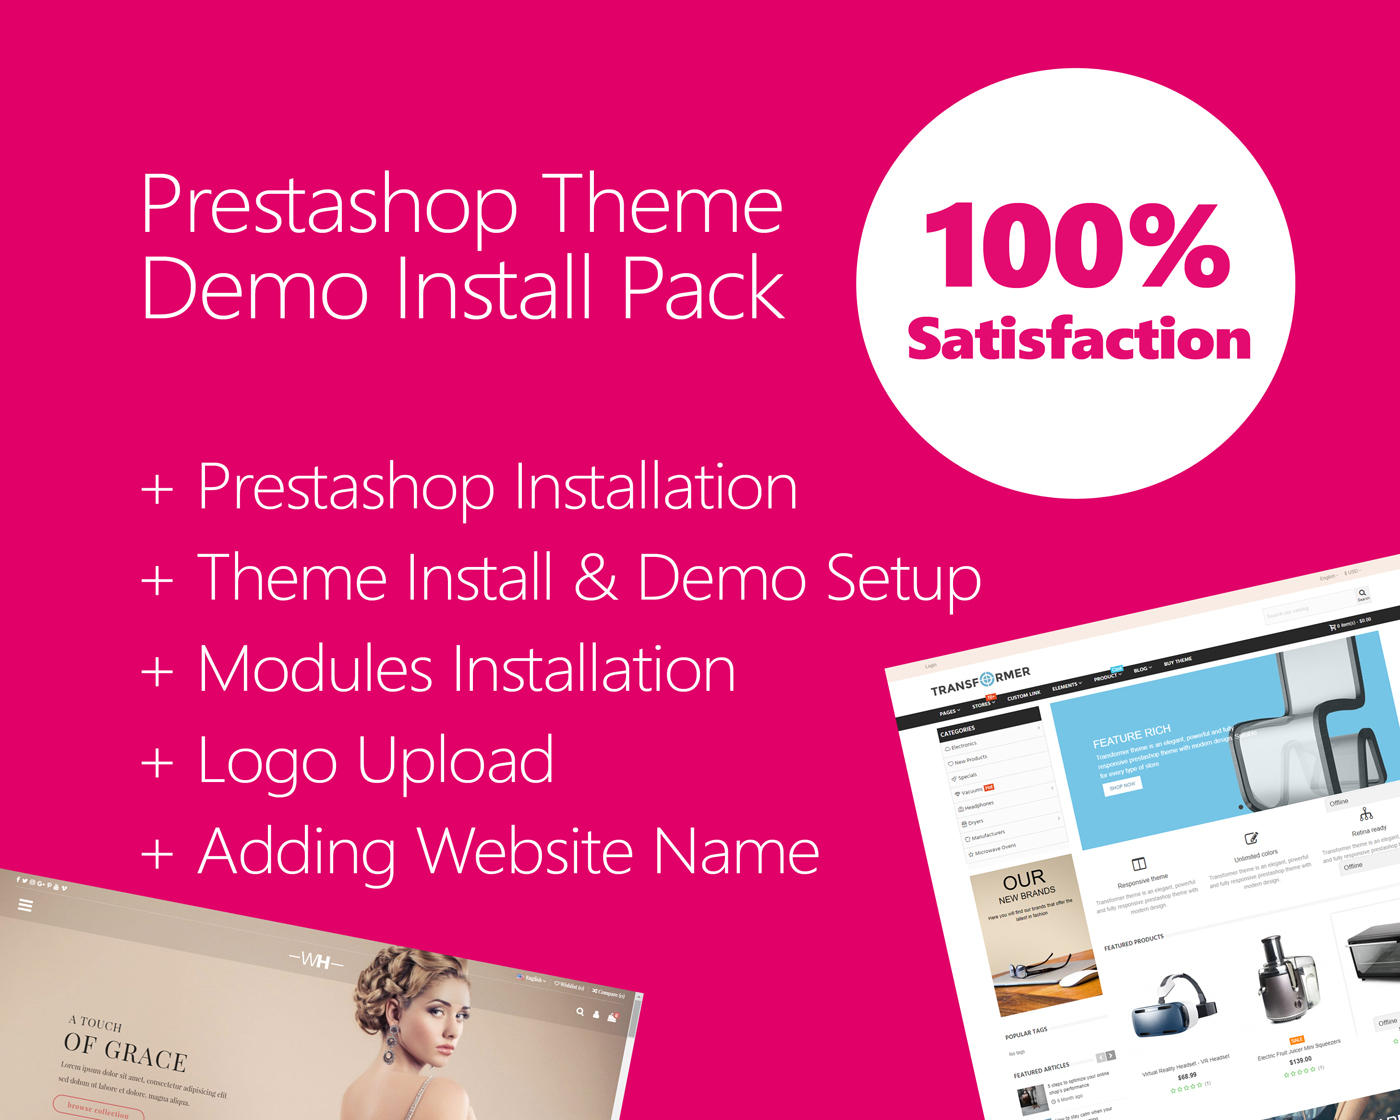 Prestashop Theme Install & Demo Setup (+ Logo Setup)